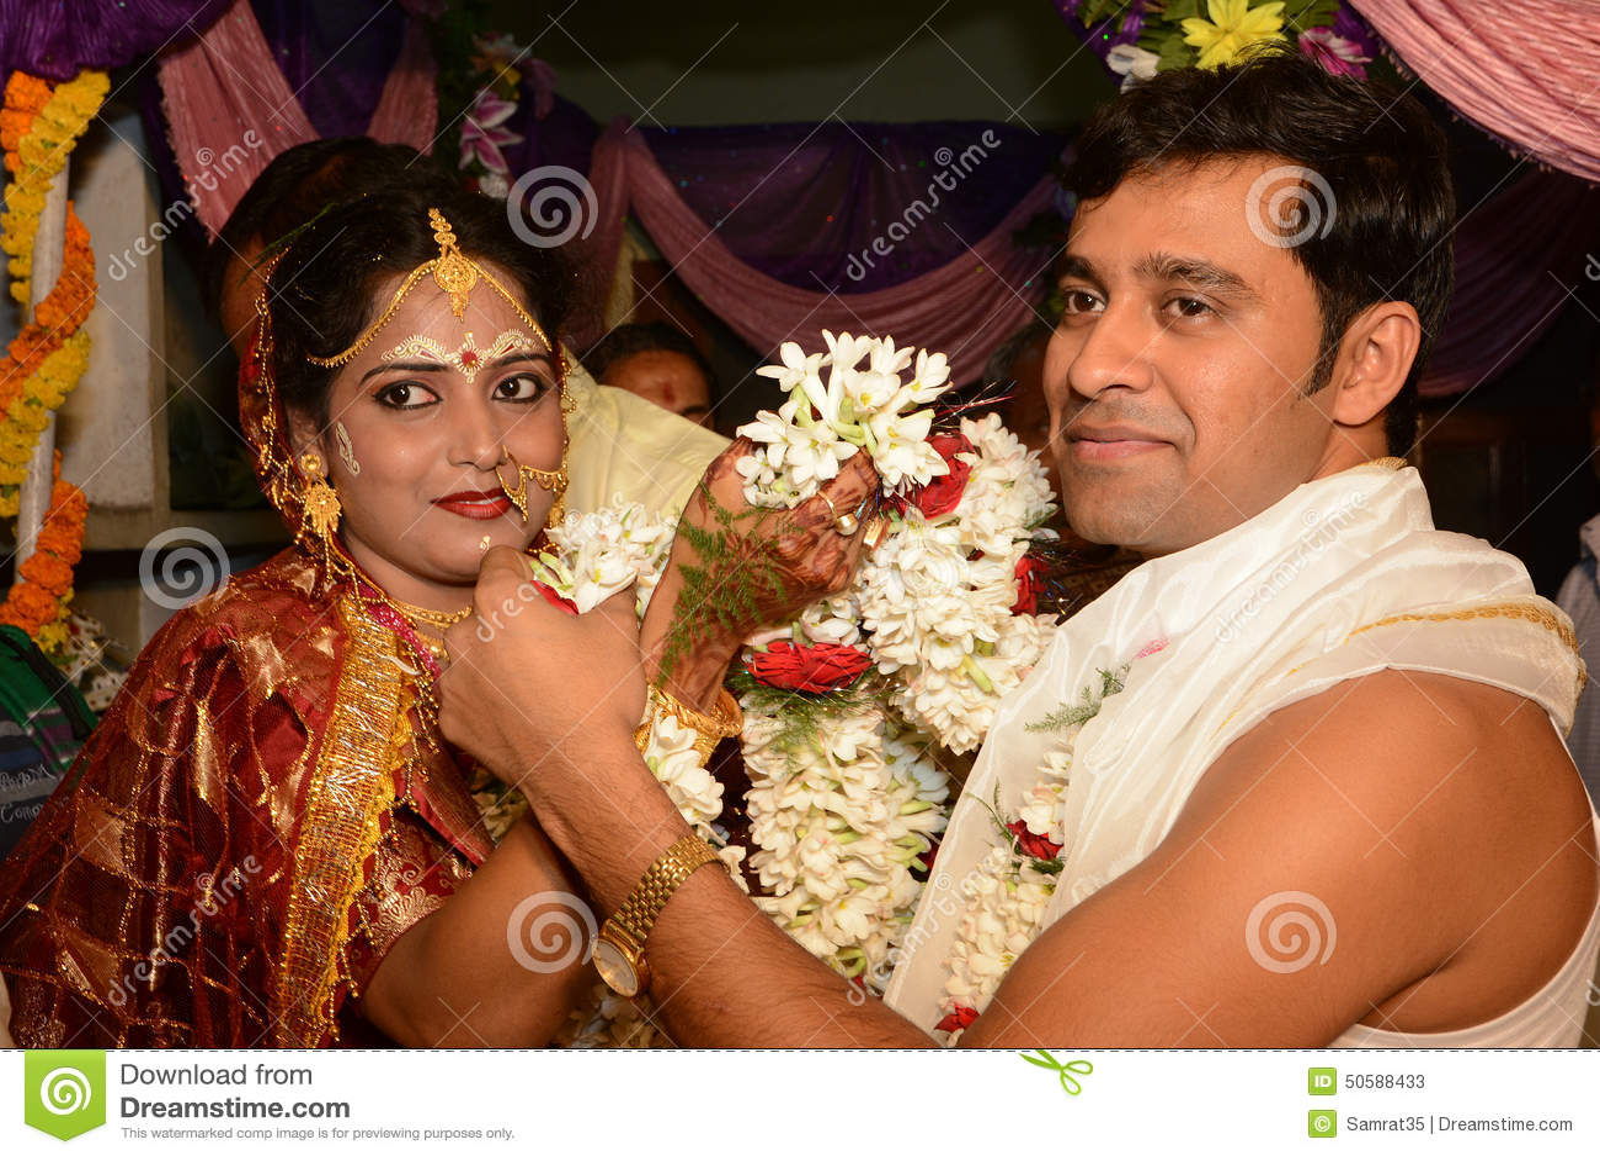 Marriage ornaments - Hindu Marriage Stock Photos